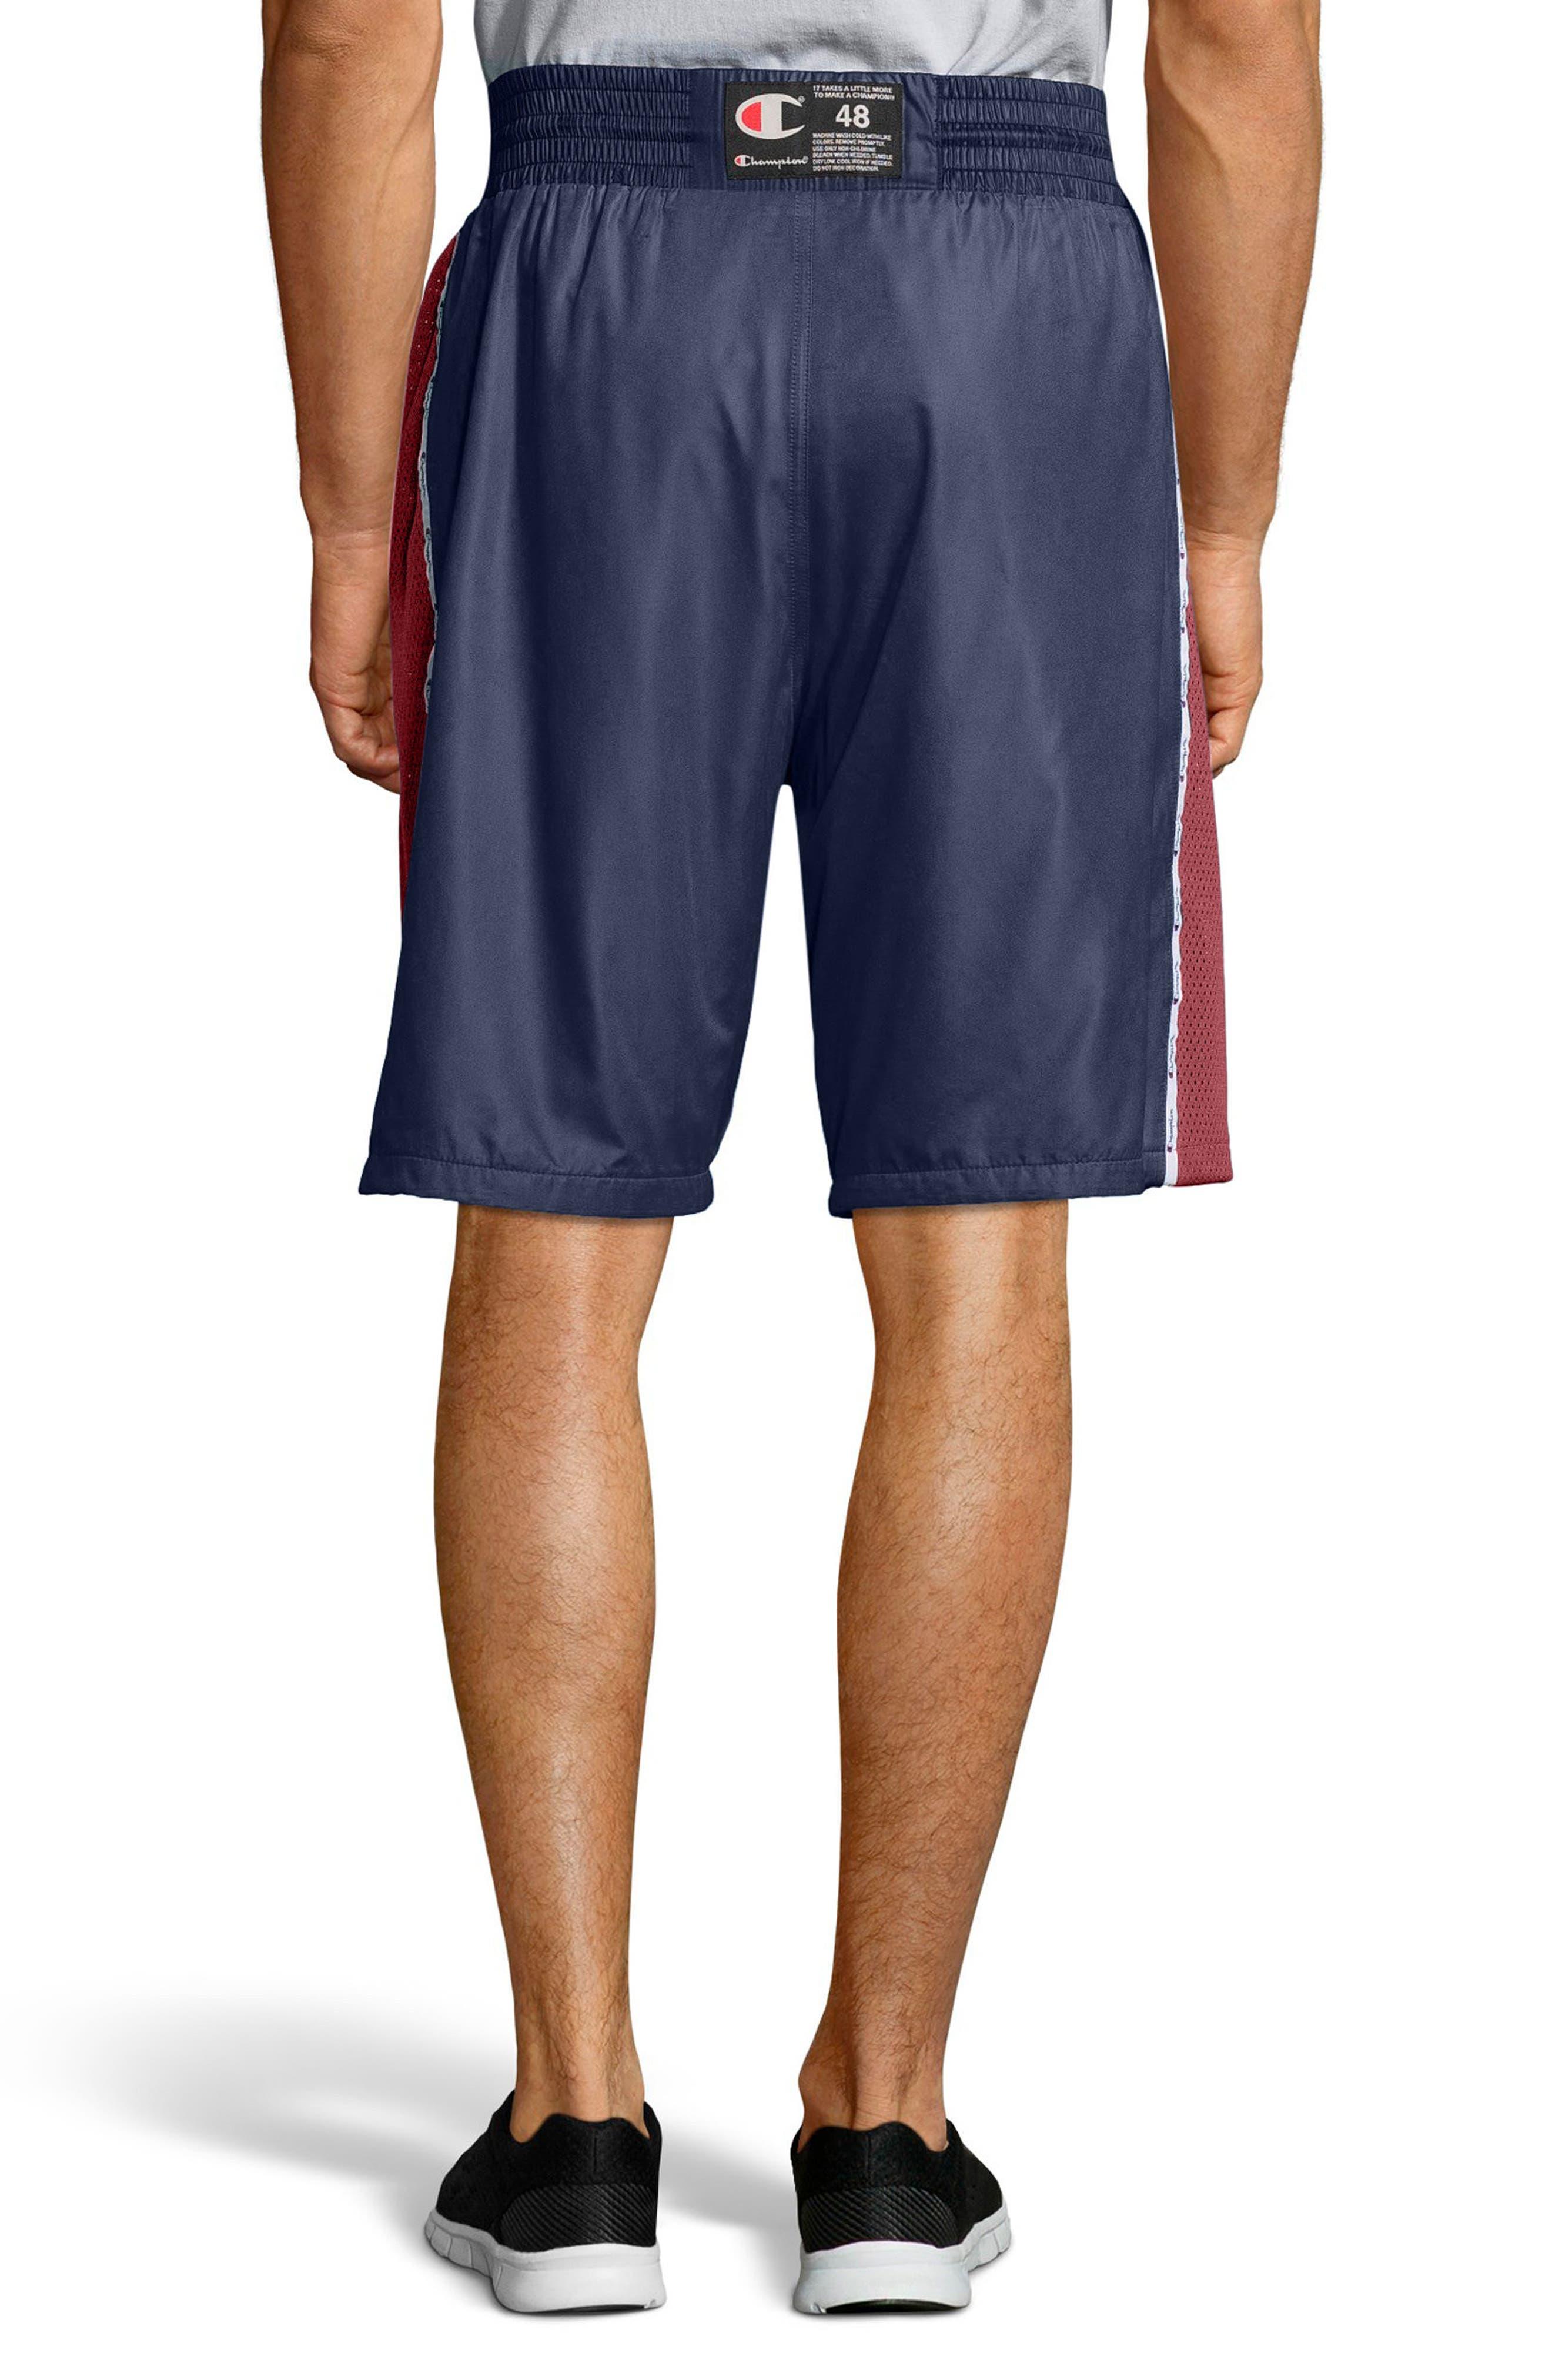 Satin Shorts,                             Alternate thumbnail 2, color,                             Imperail Indigo/Navy